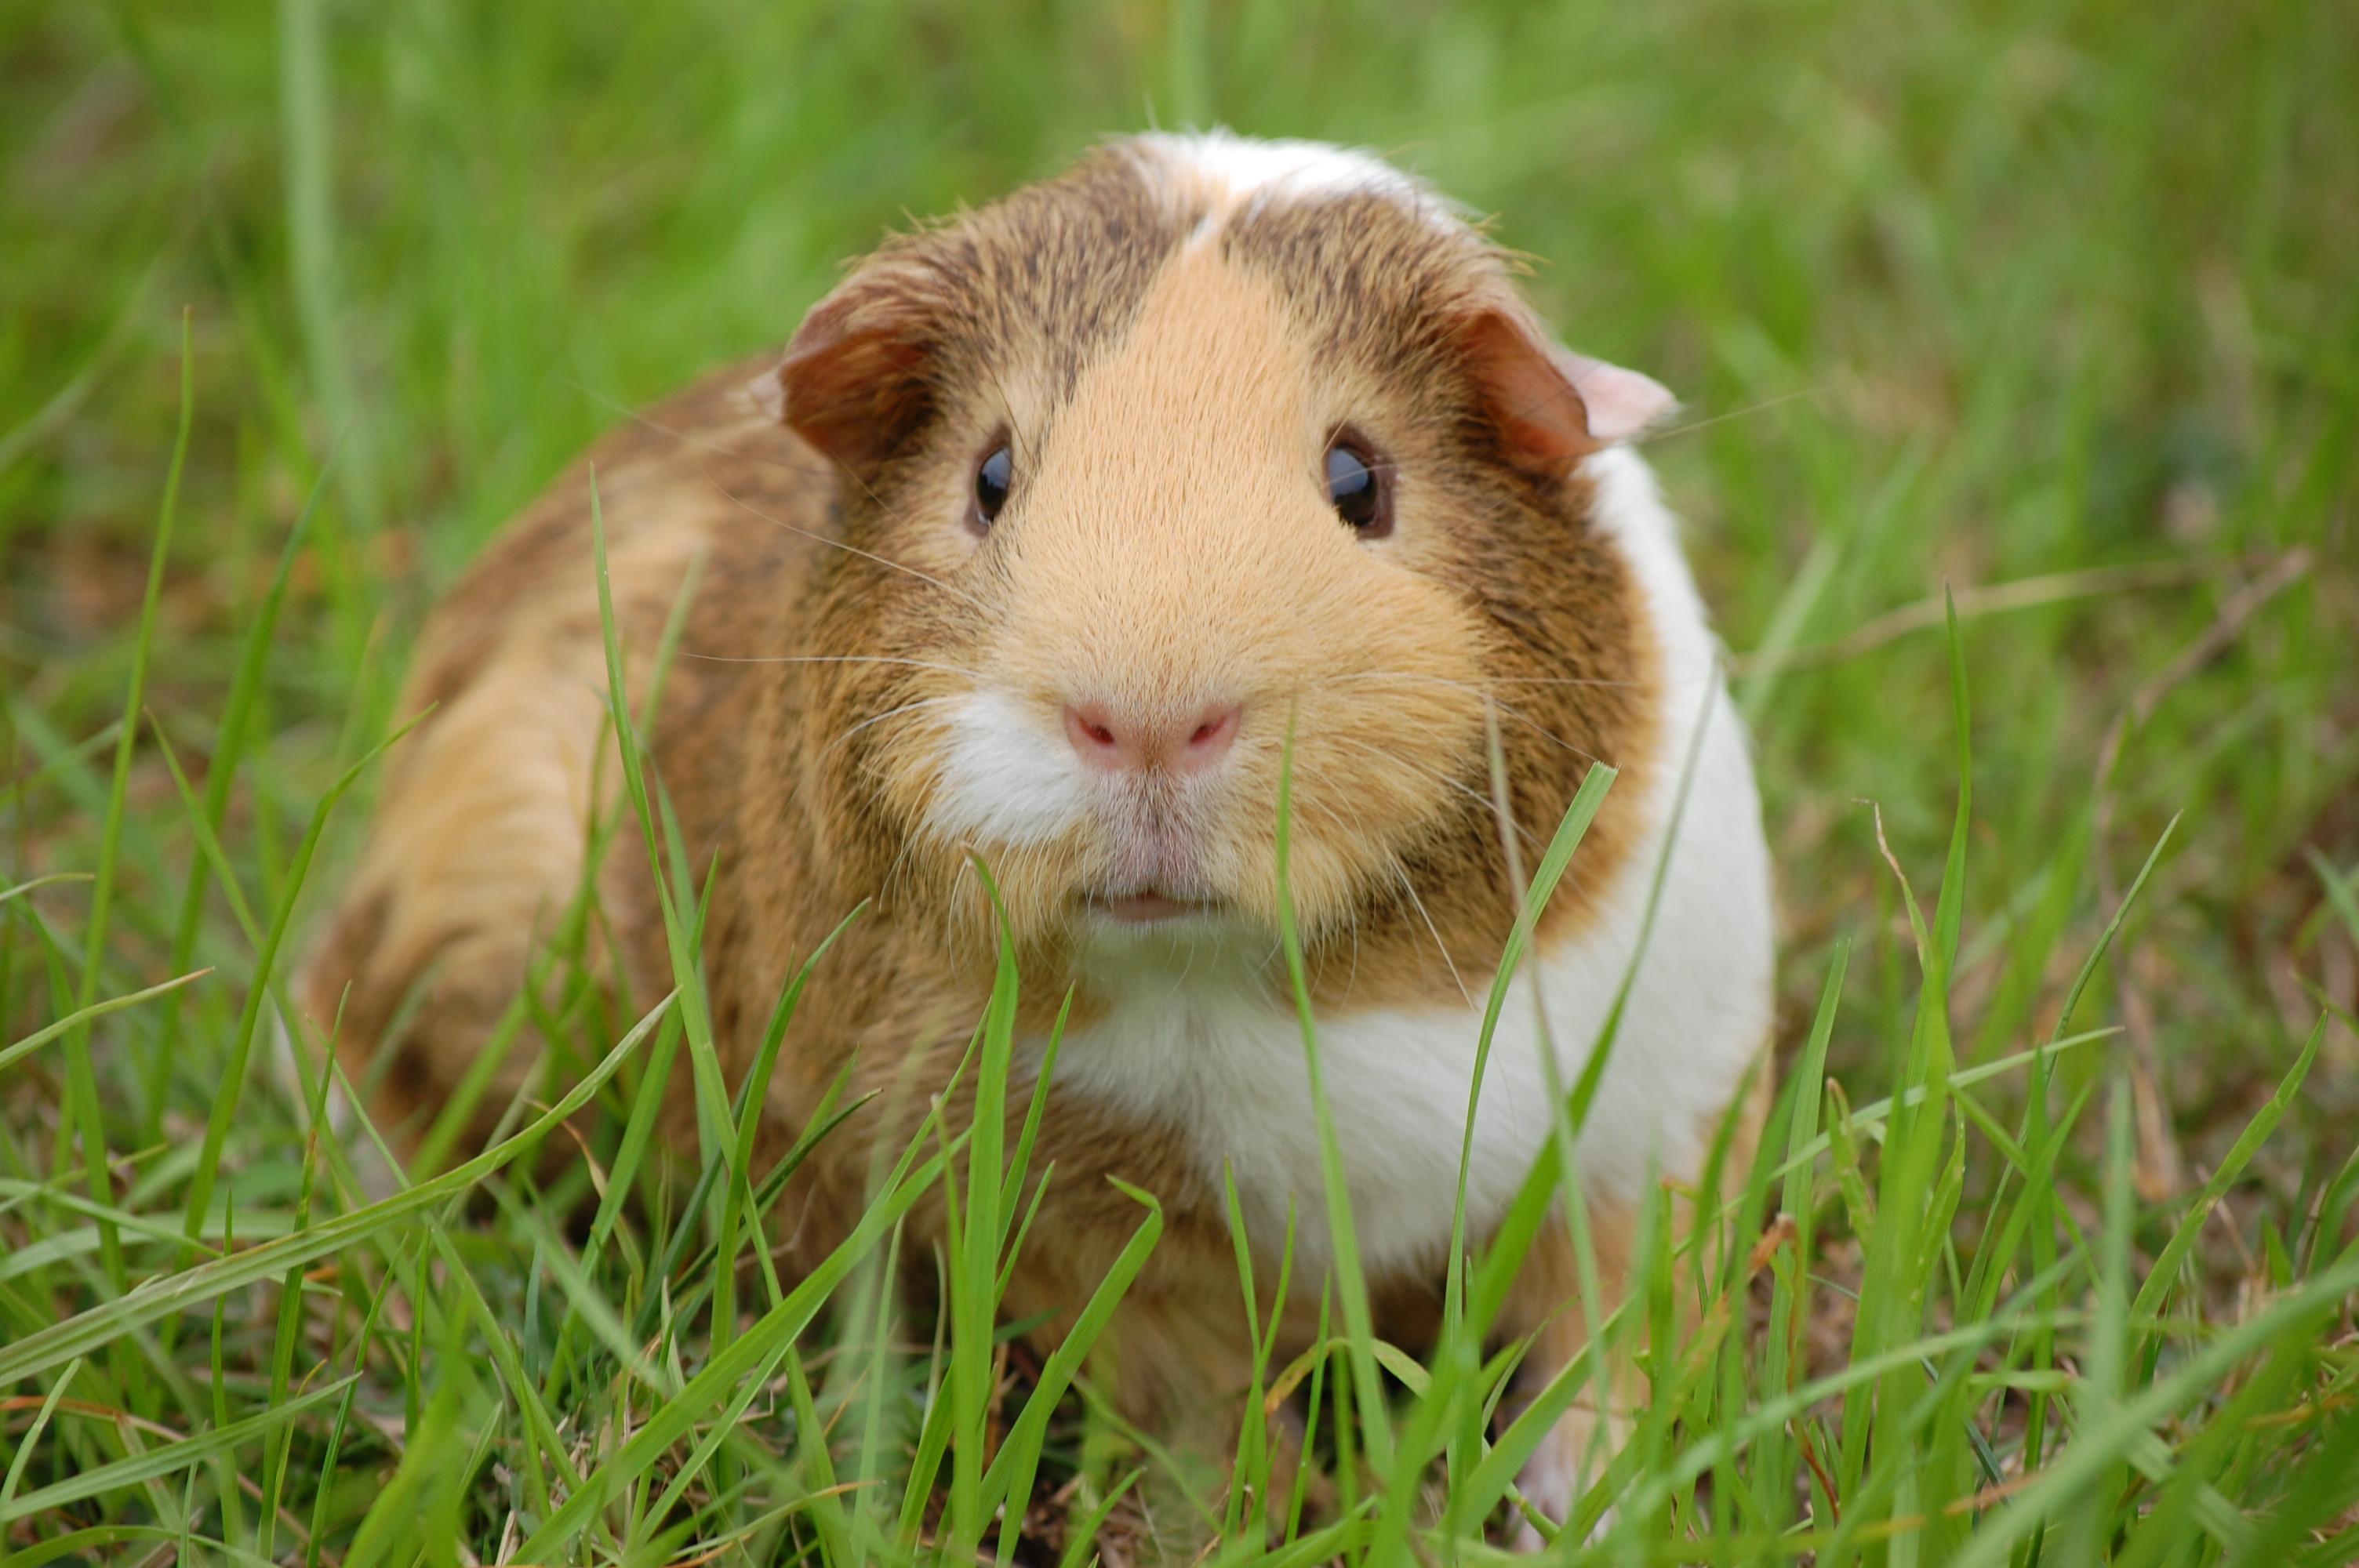 Guinea Pig Clicker Training Kit